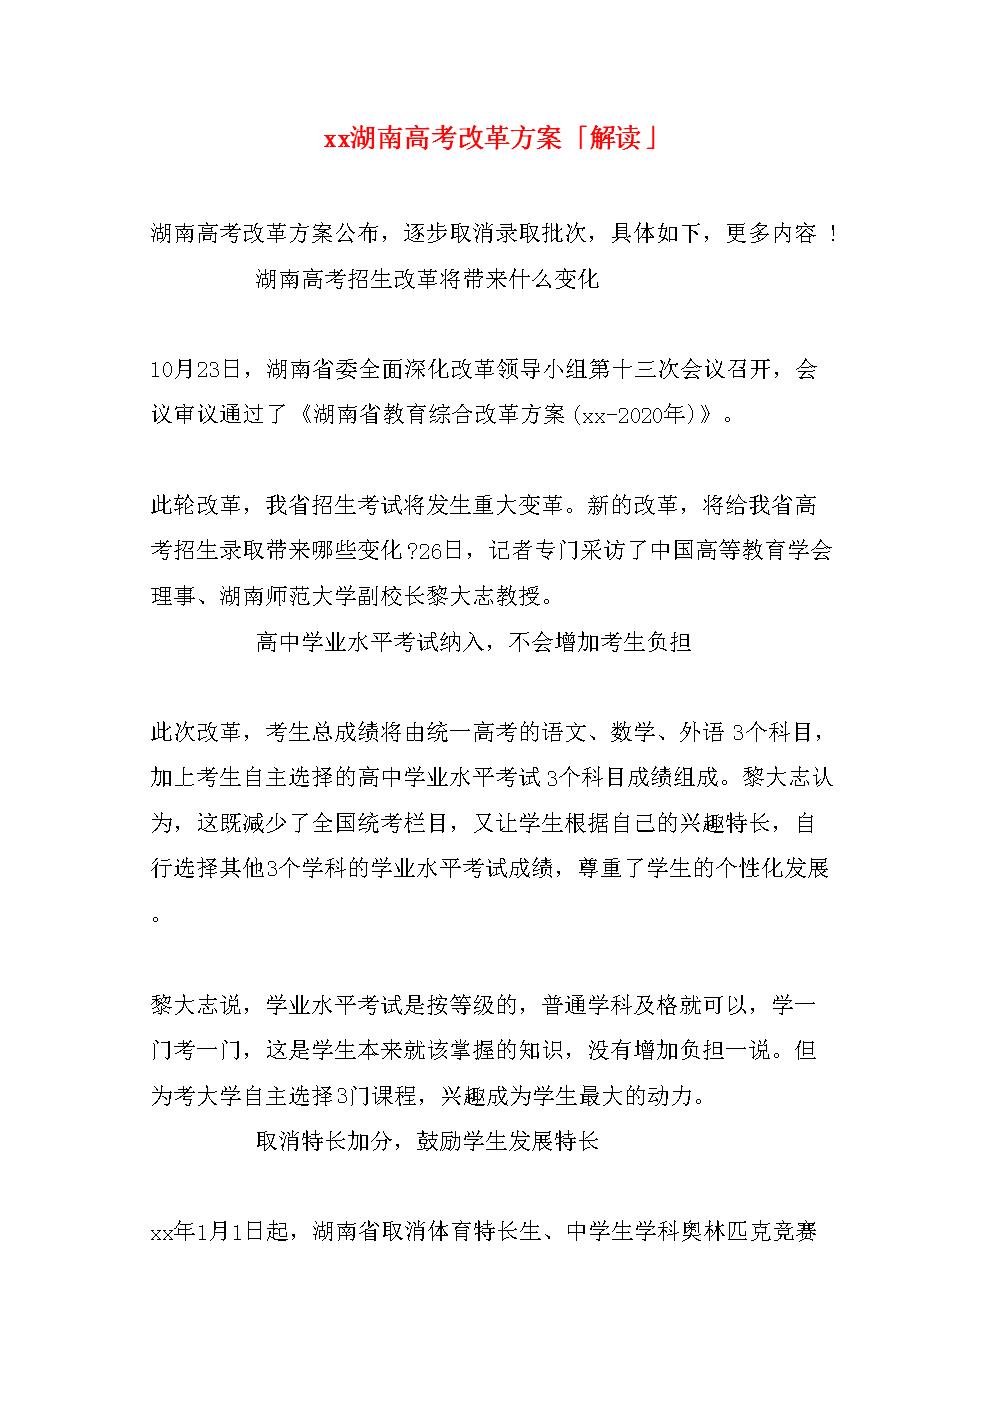 xx湖南高考改革方案「解读」.doc